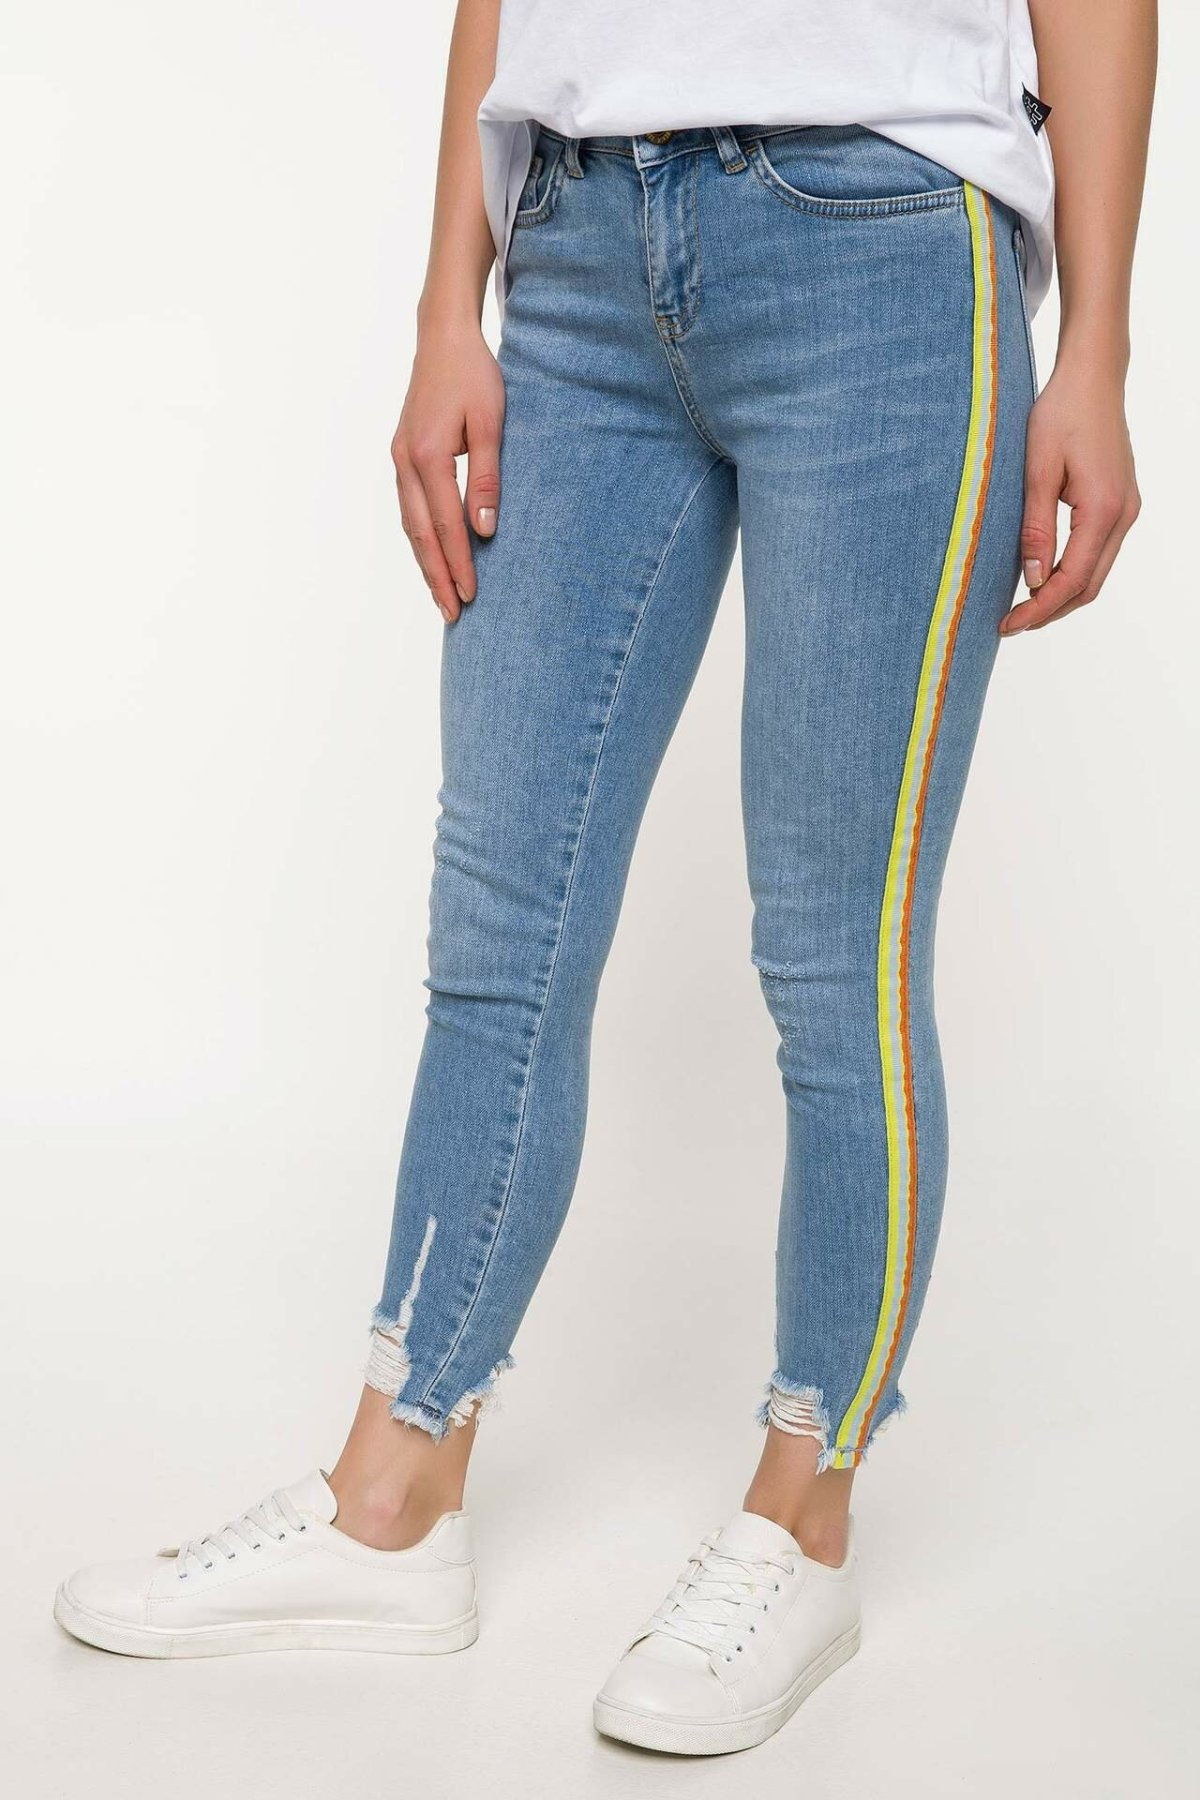 DeFacto Casual Woman Light Blue Denim Jeans Mid-waist Skinny Ninth Pants Mom Jeans Stretch Ankle Pencil Trousers-J2014AZ18SM